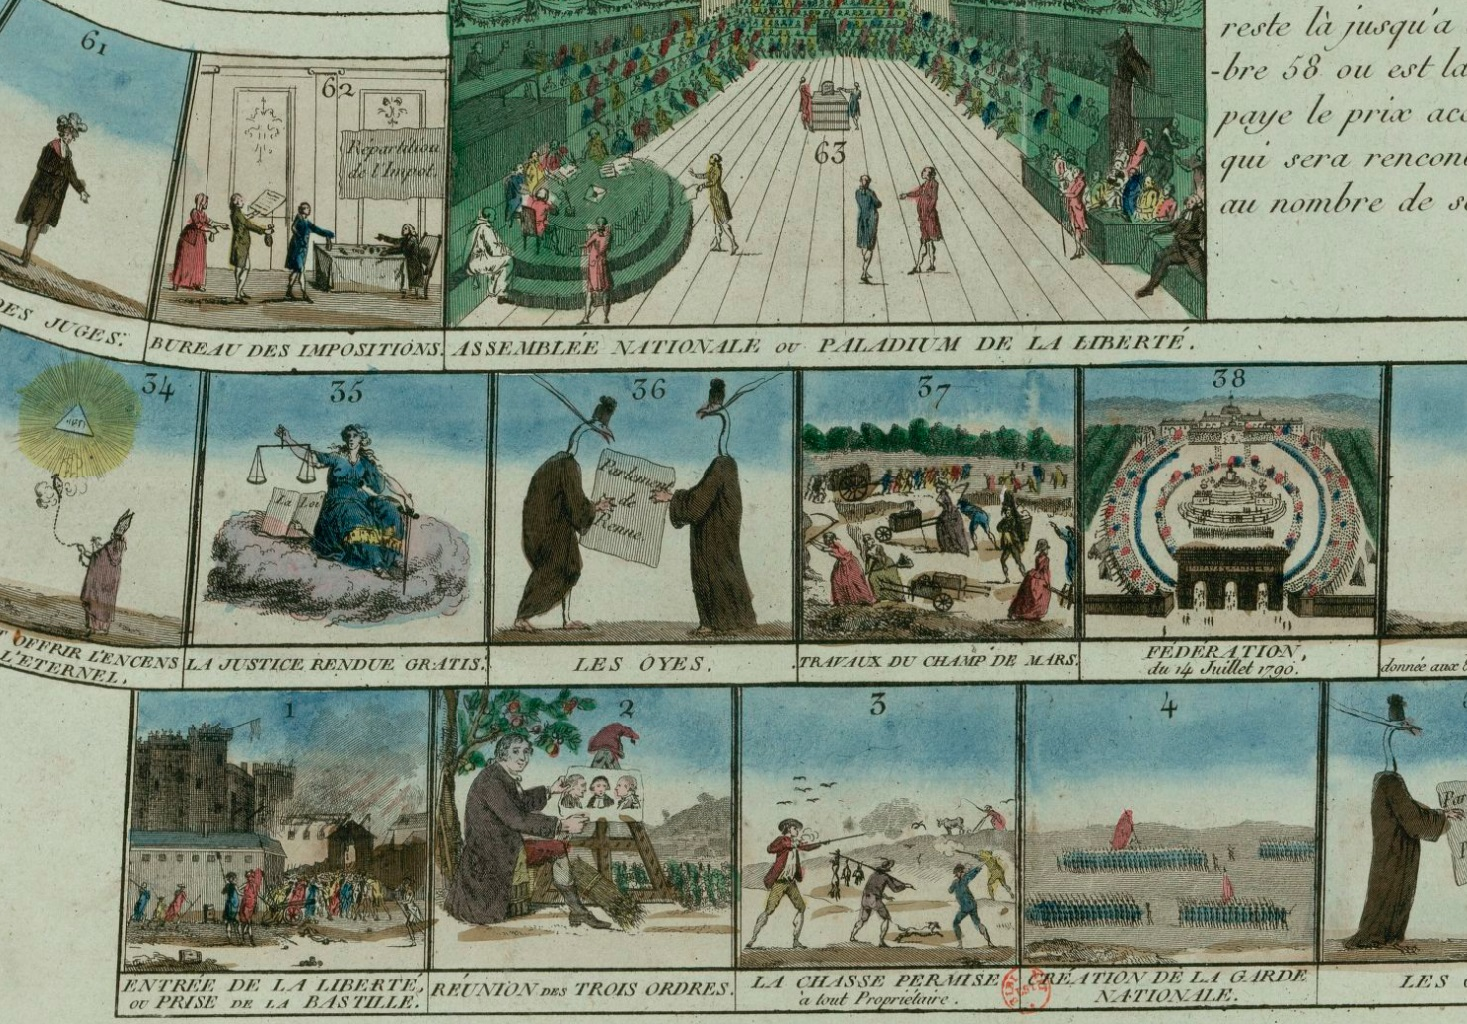 1789-91-jeu-de-la-revolution-det1.jpg